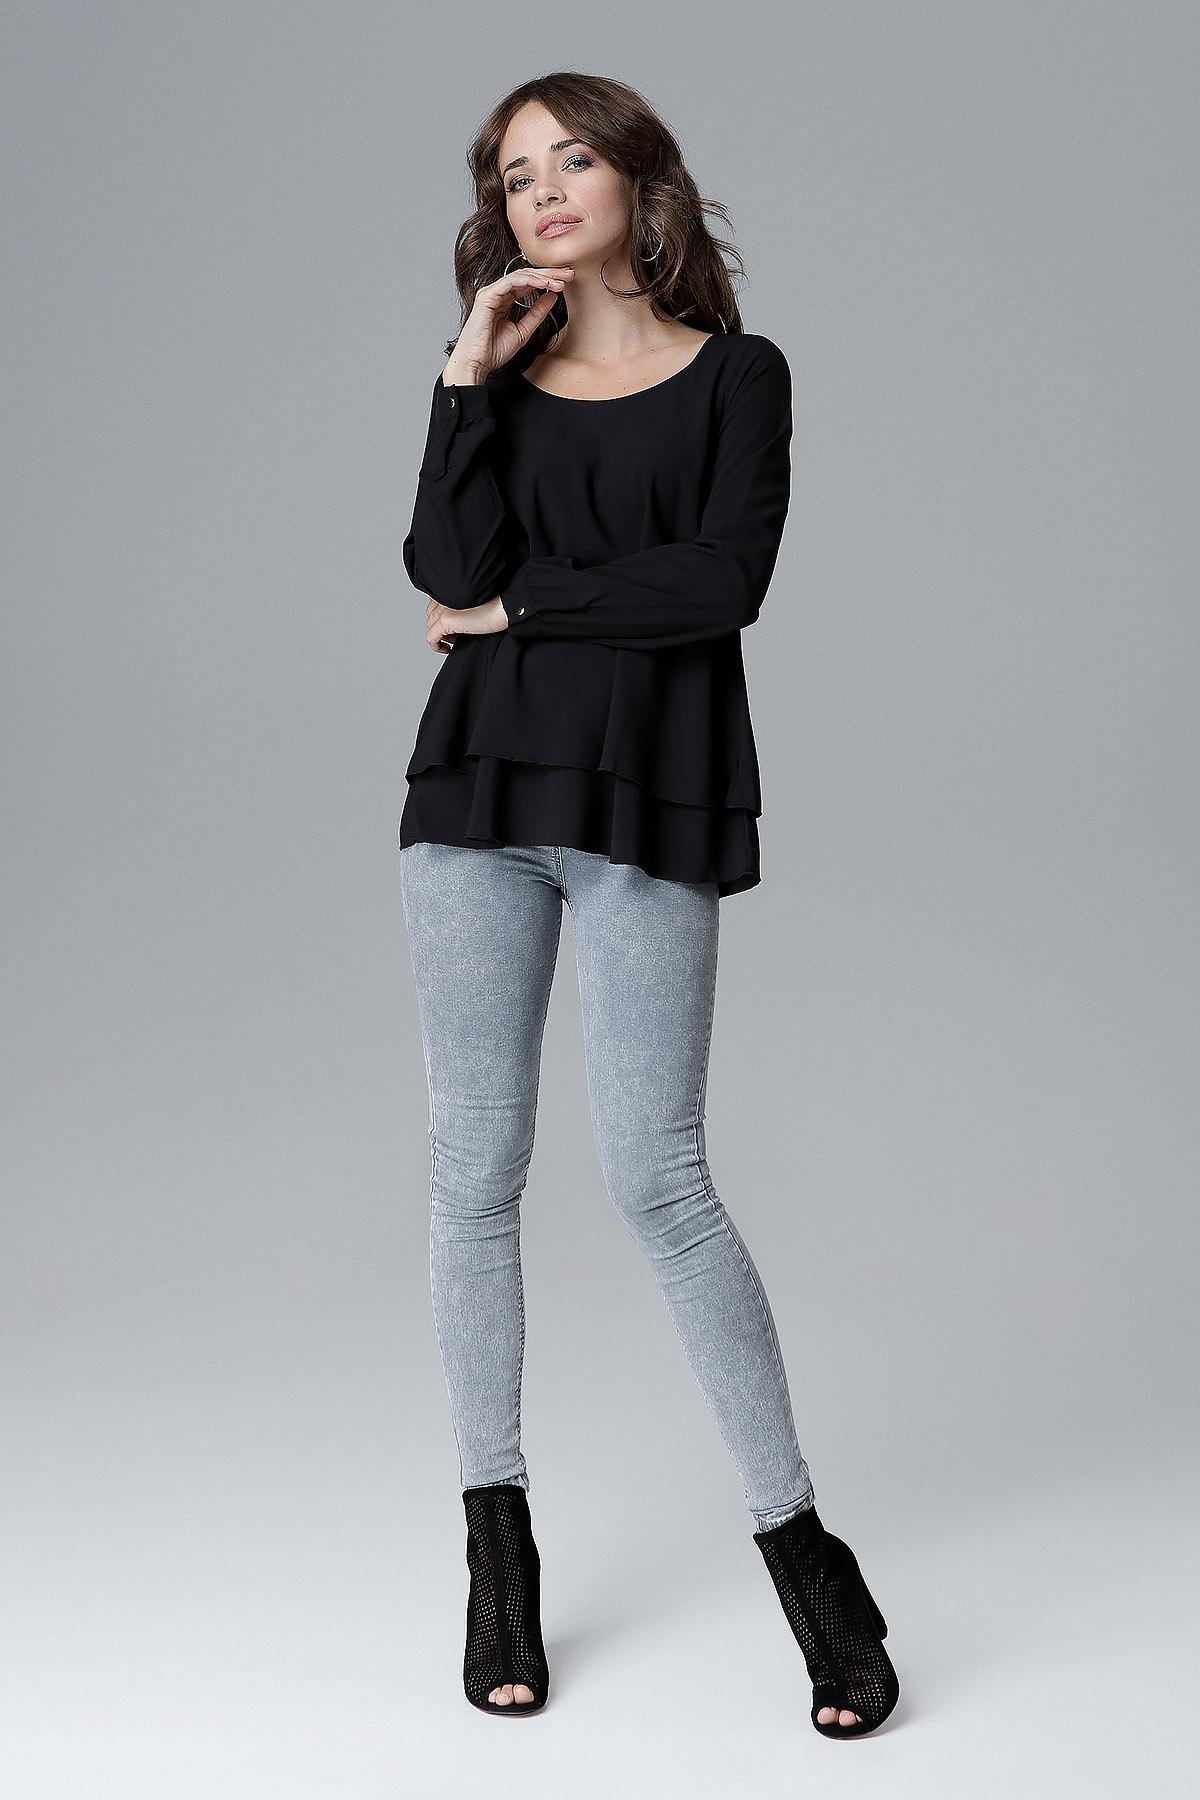 CM4157 Luźna bluzka damska z falbanką - czarna